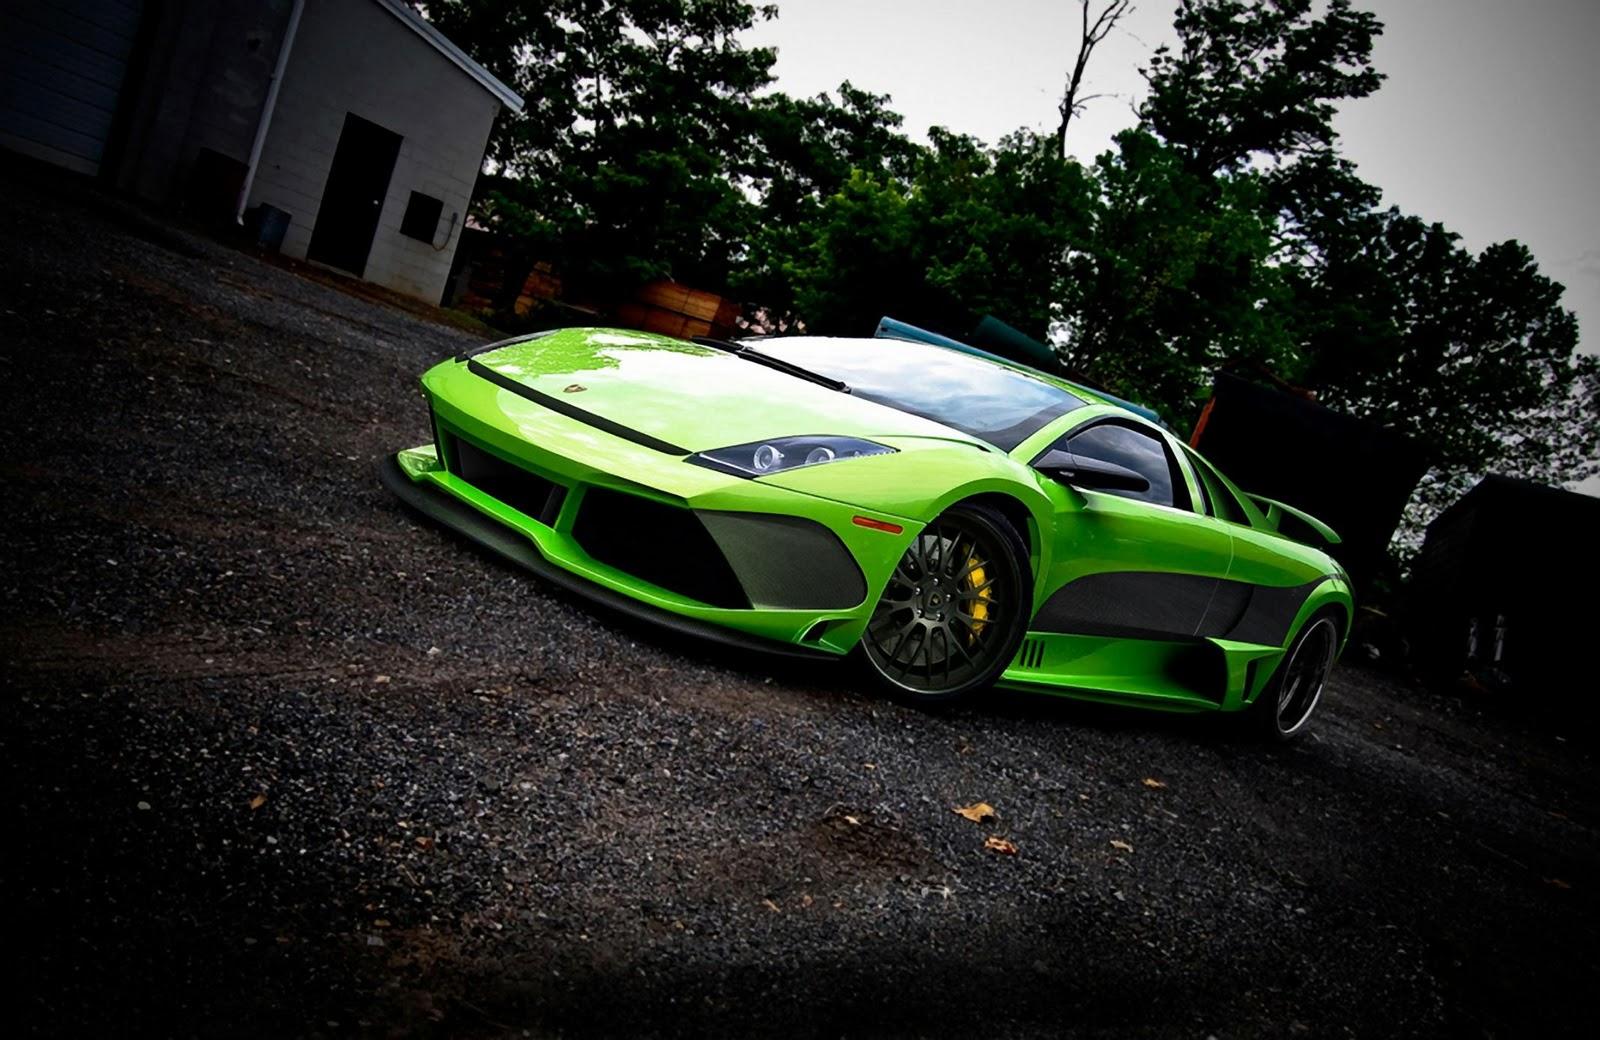 Wallpapers Green And Lamborghini On Pinterest: Green Lamborghini Gallardo Wallpaper HD